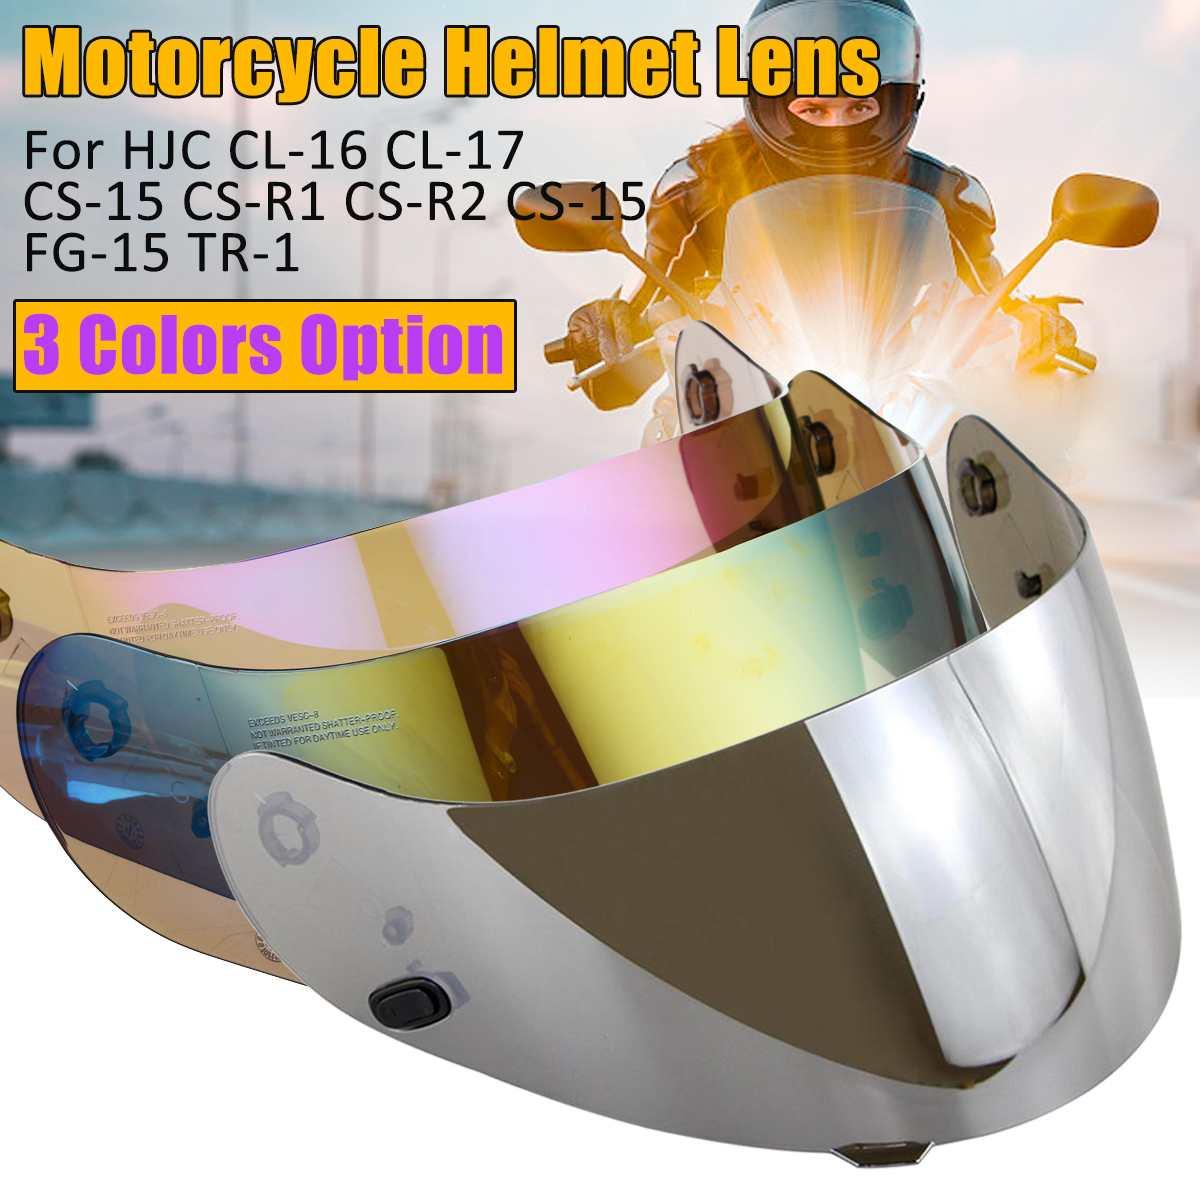 Motorcycle Visor Helmet Lens For HJC CL-16 CL-17 CL-ST CL-SP CS-R1 CS-R2 CS-15